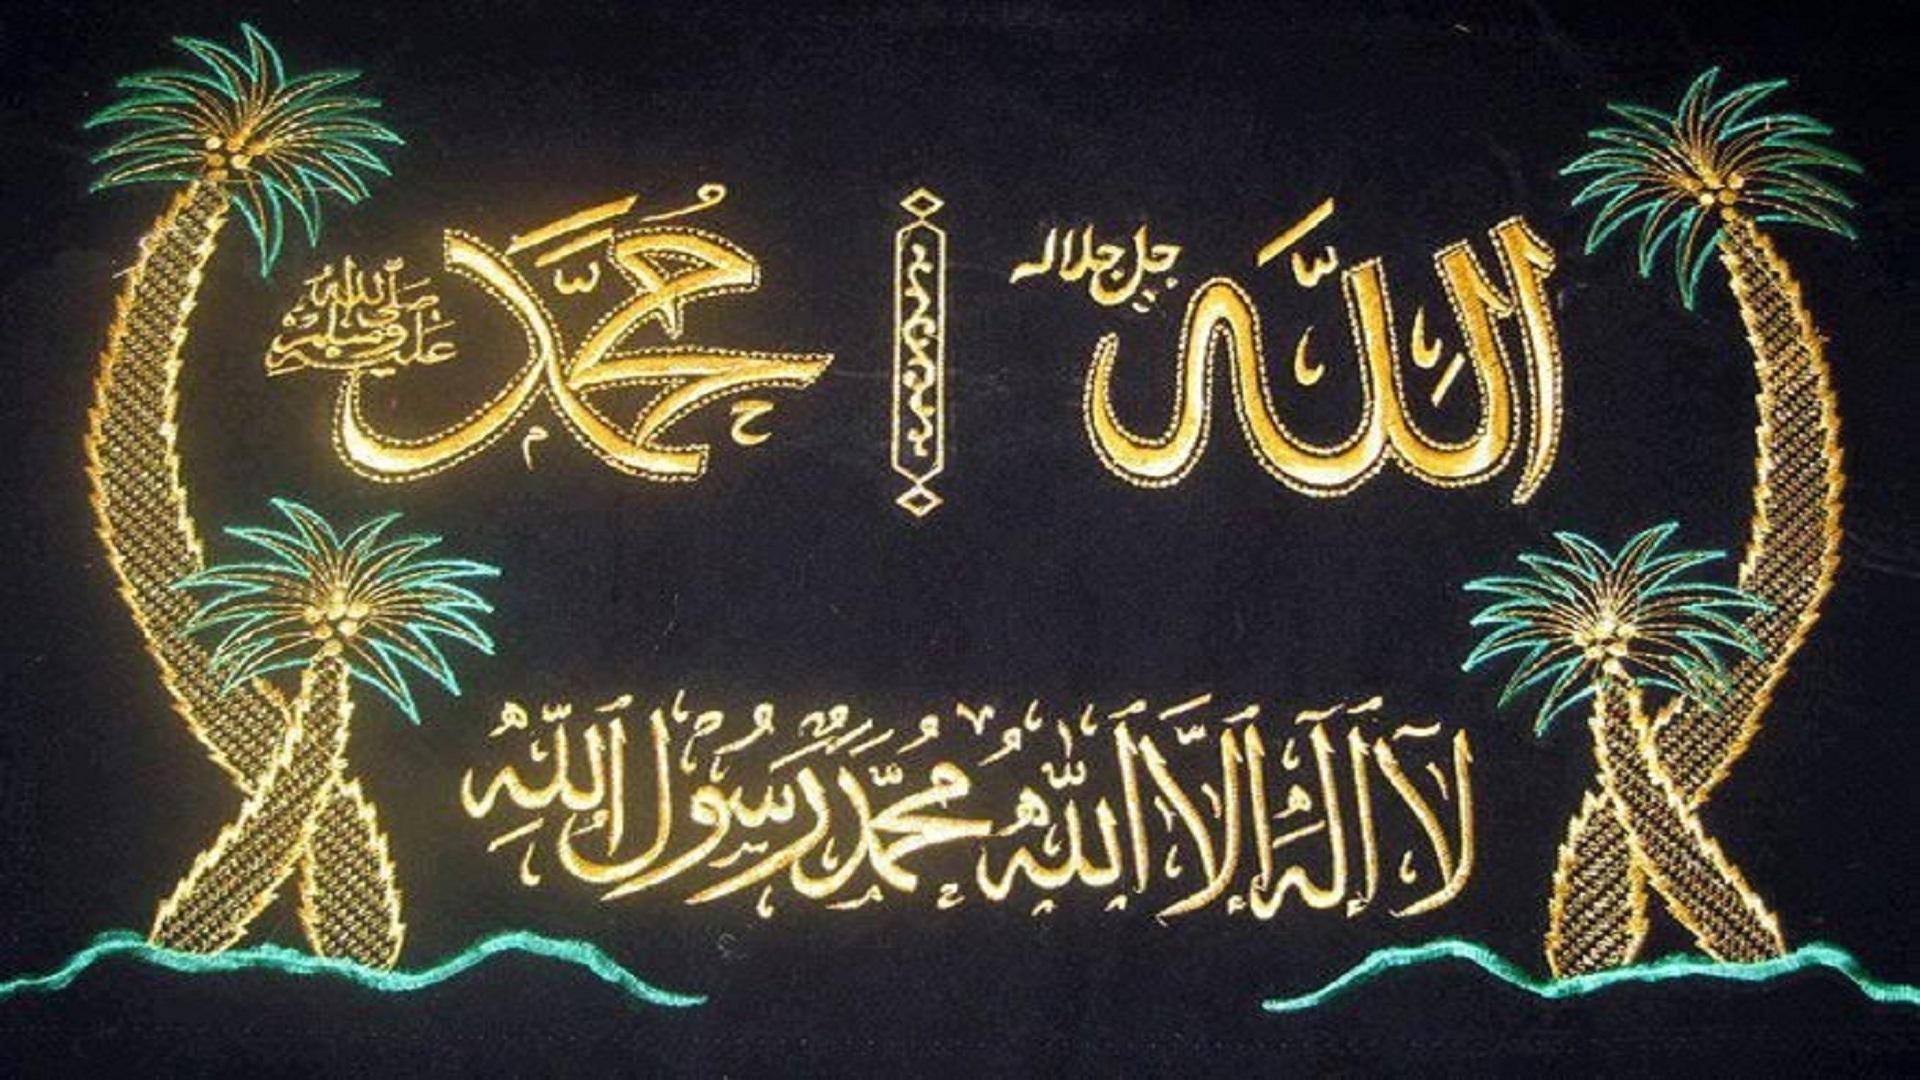 allah-muhammad-name-wallpapers-free-hd-for-desktop - hd wallpaper